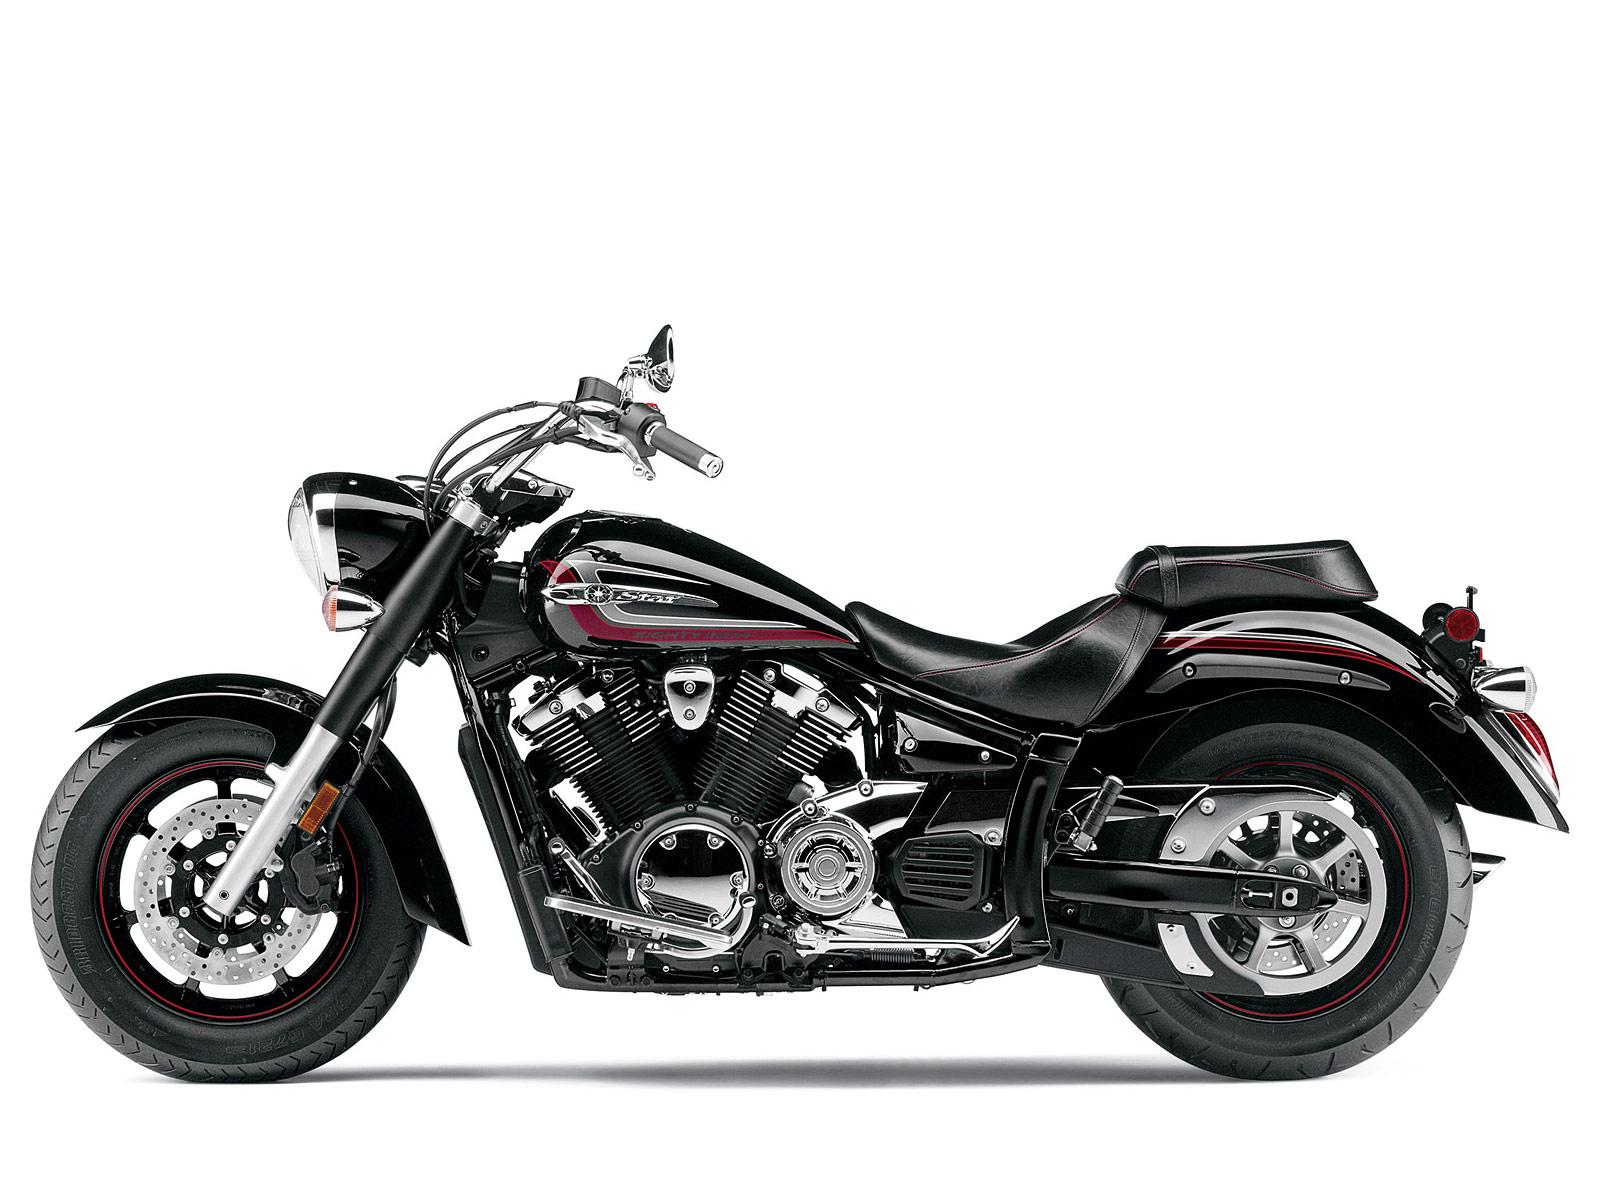 2013 yamaha v star 1300 insurance information motorcycle for Yamaha 1300 motorcycle